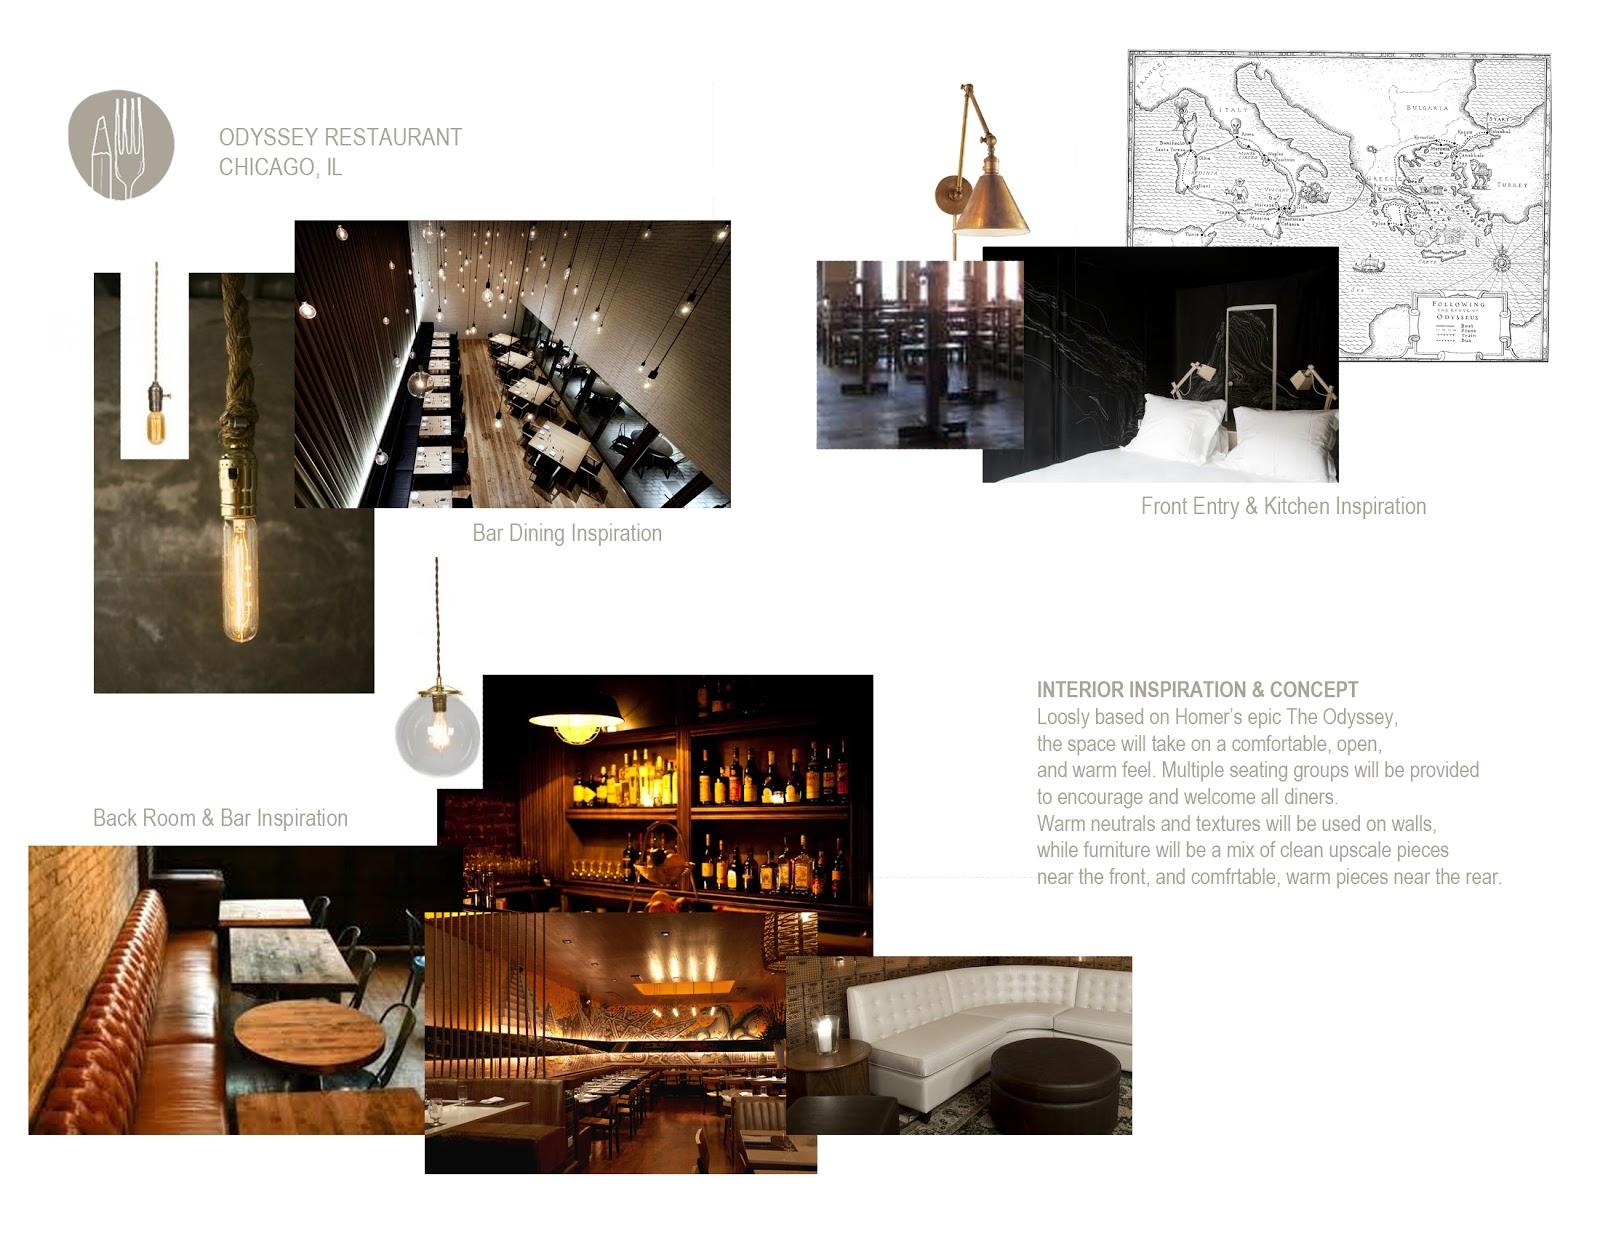 Kaper Design; Restaurant & Hospitality Design Inspiration Completed